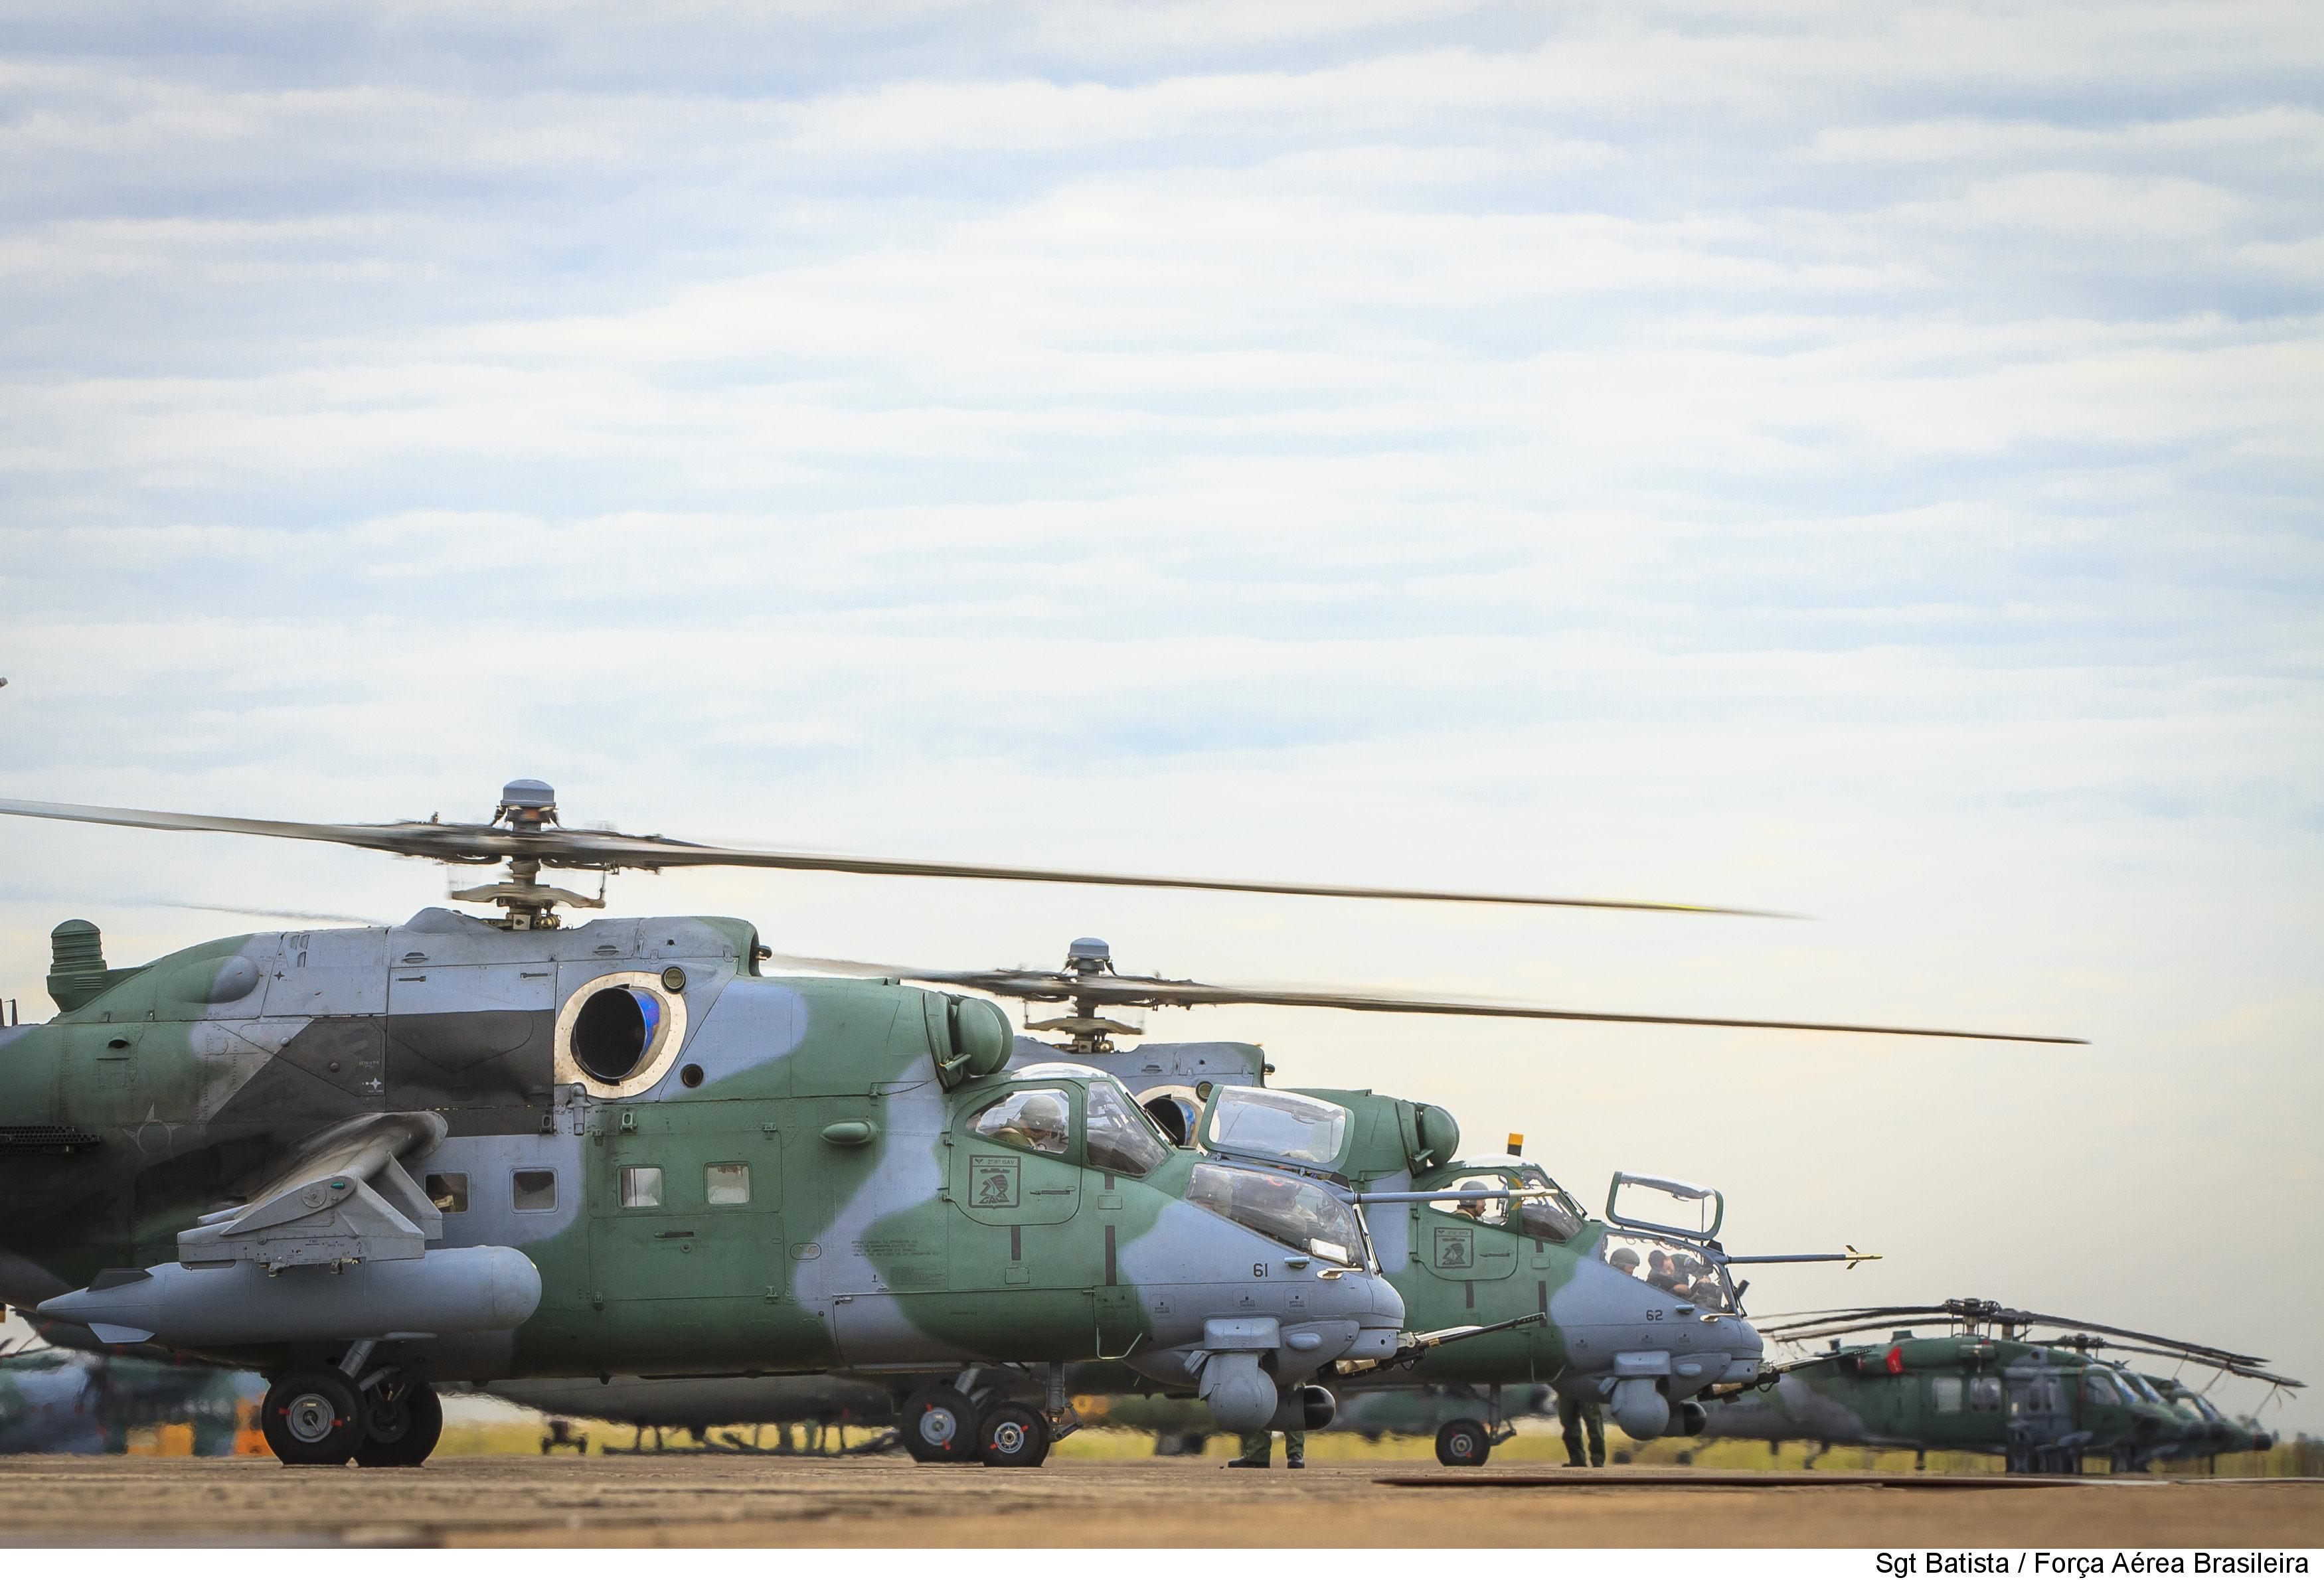 Brazilian Air Force AH-2 Sabre and H-60 Blackhawk